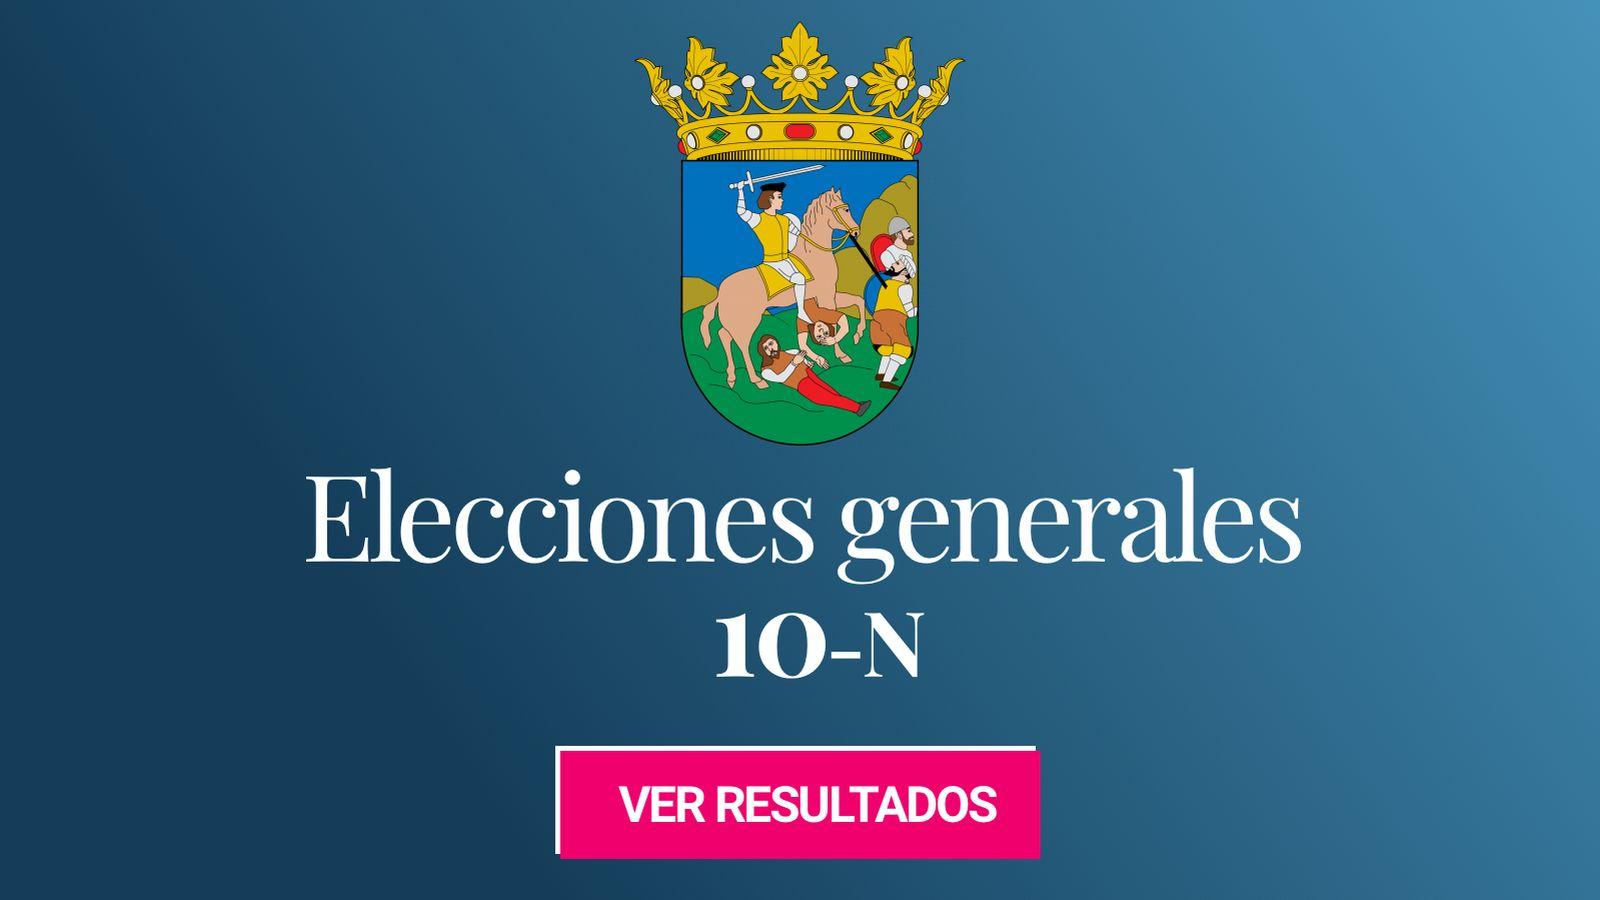 Foto: Elecciones generales 2019 en Vélez-Málaga. (C.C./EC)